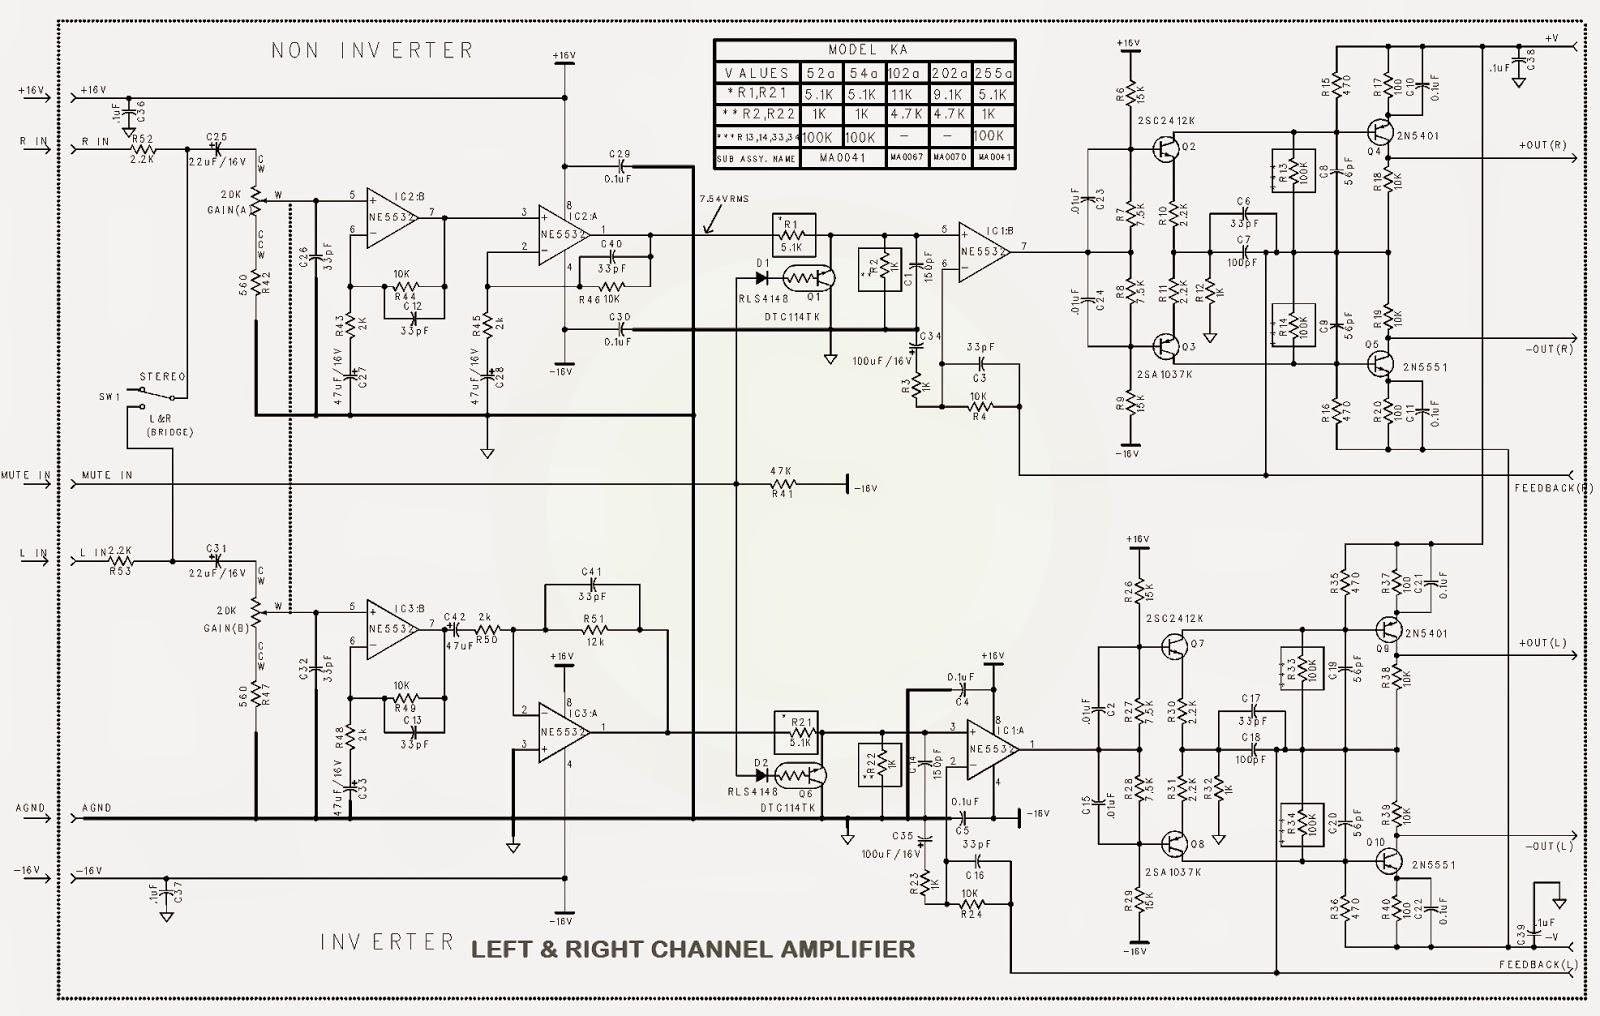 1988 mazda b2200 fuse box diagram